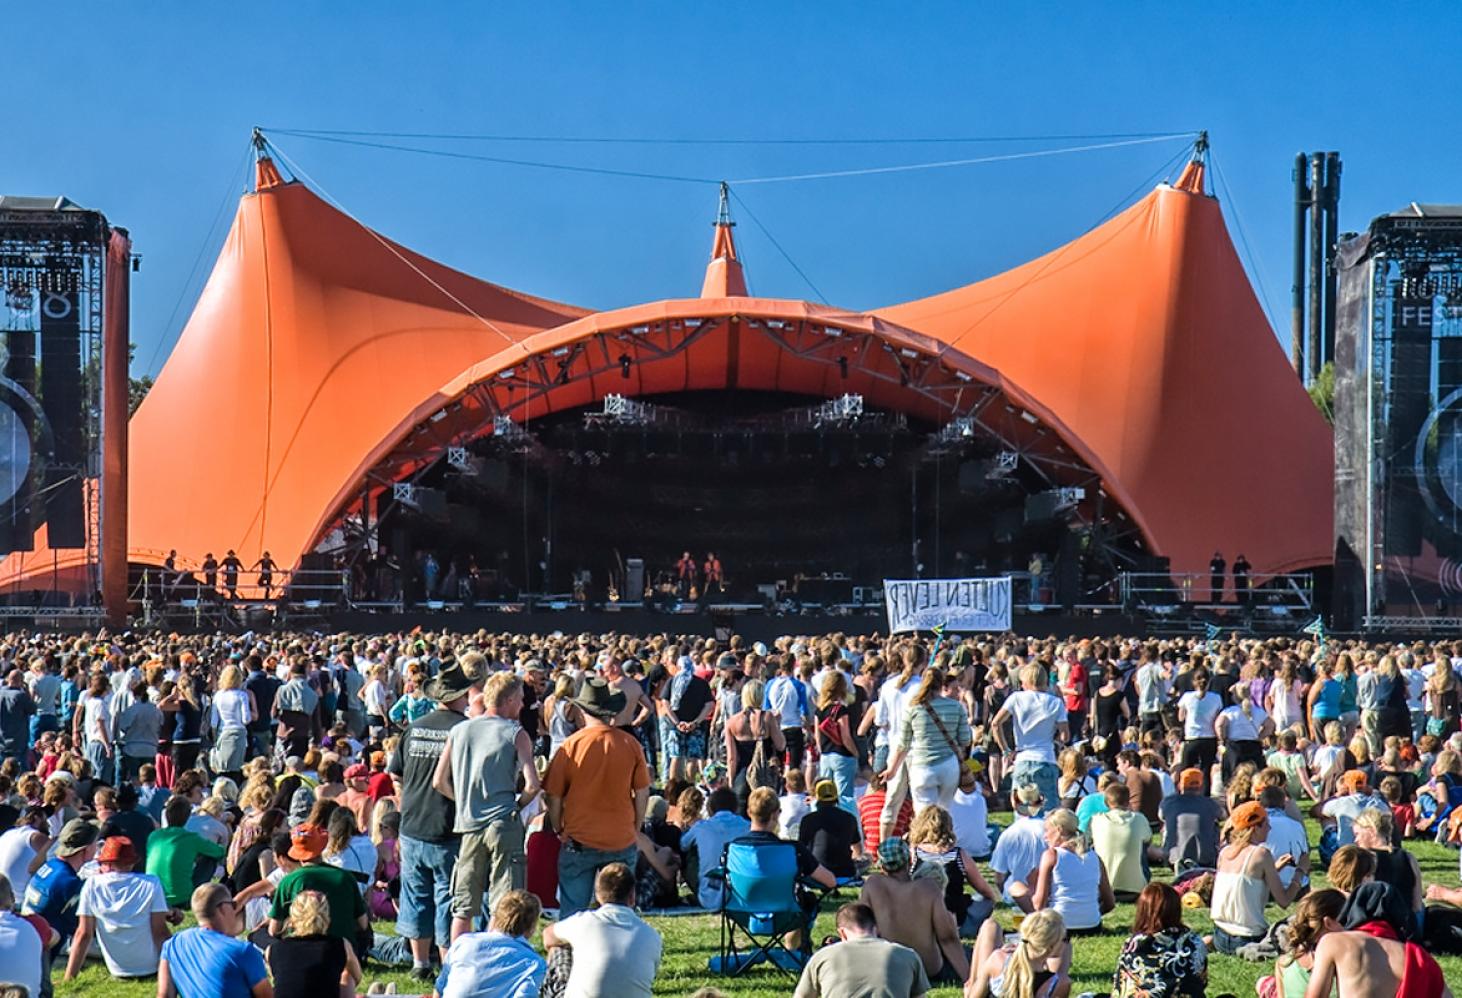 Roskilde Festival (Дания, конец июня-начало июля)